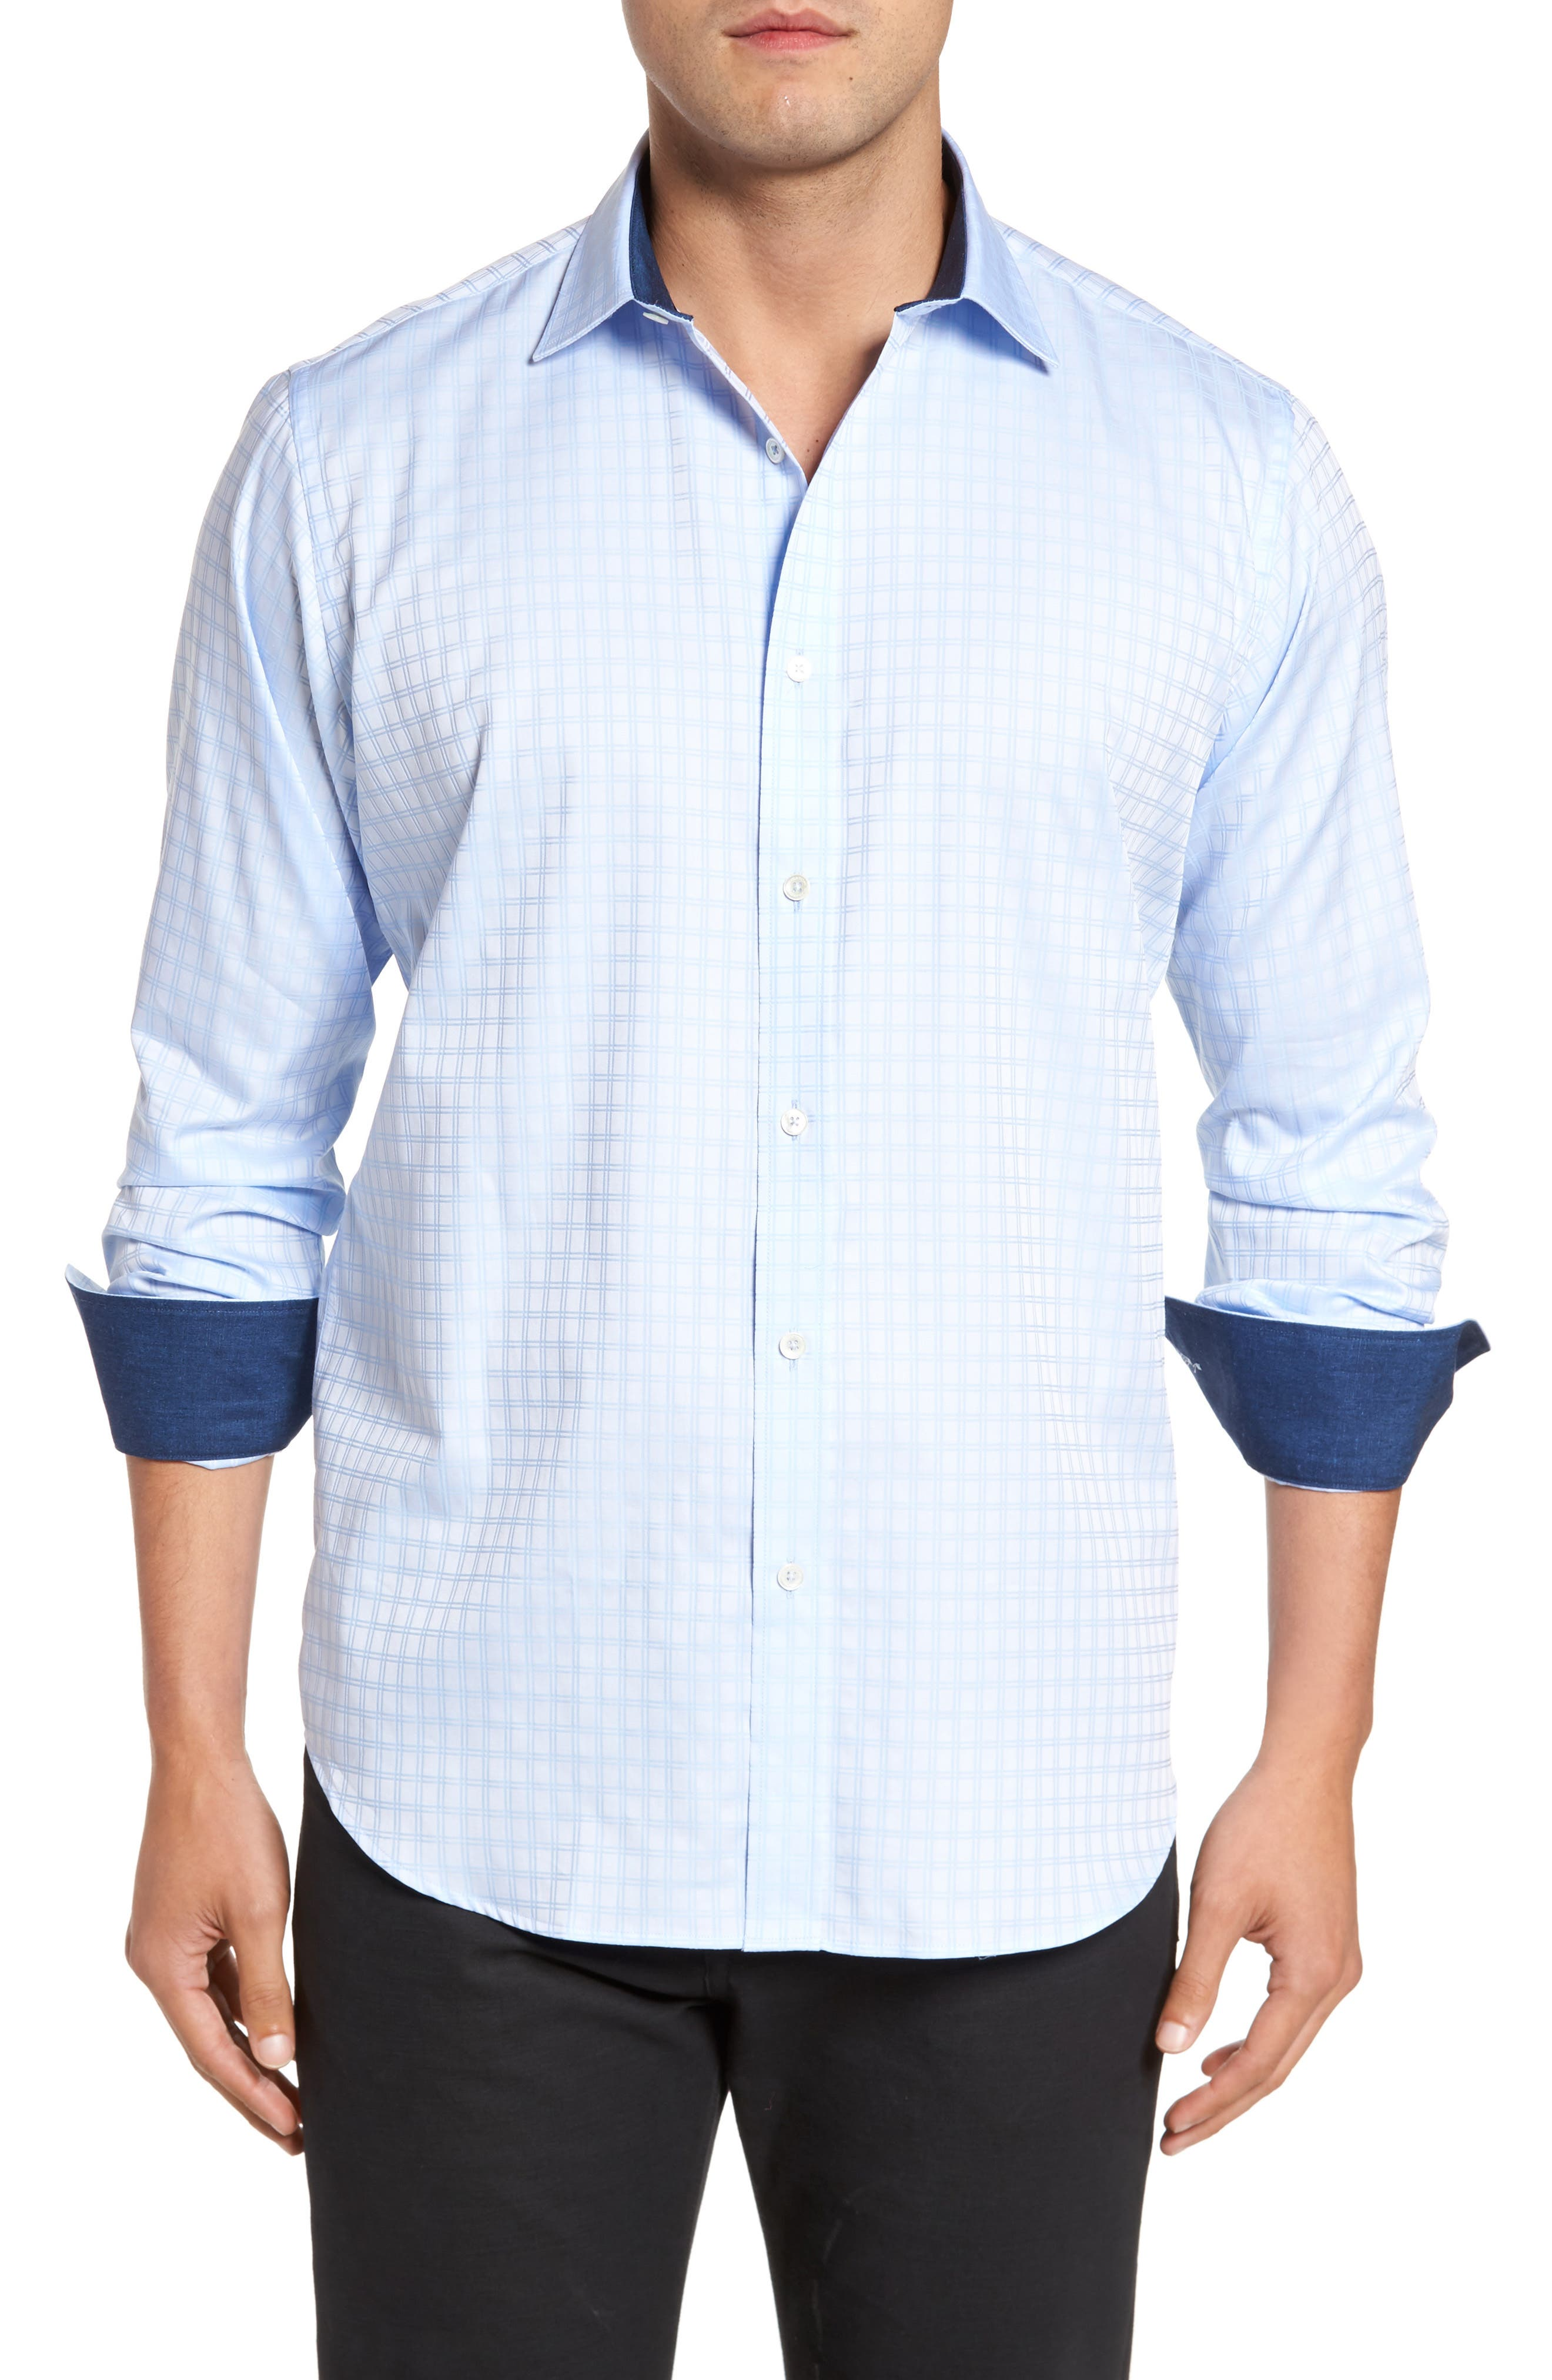 Alternate Image 1 Selected - Bugatchi Classic Fit Check Jacquard Sport Shirt